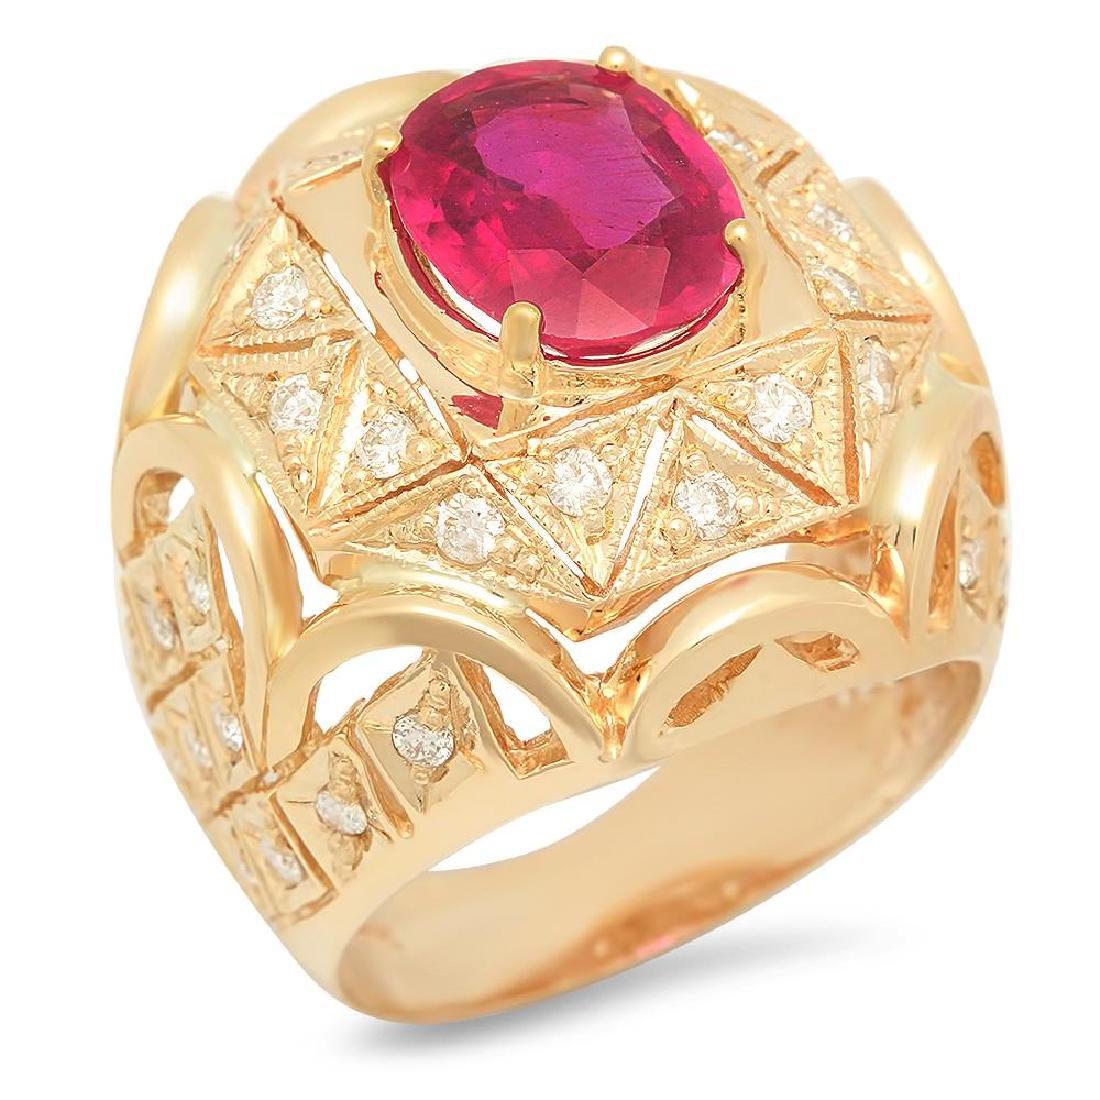 14K Gold 3.81ct Ruby 1.05cts Diamond Ring